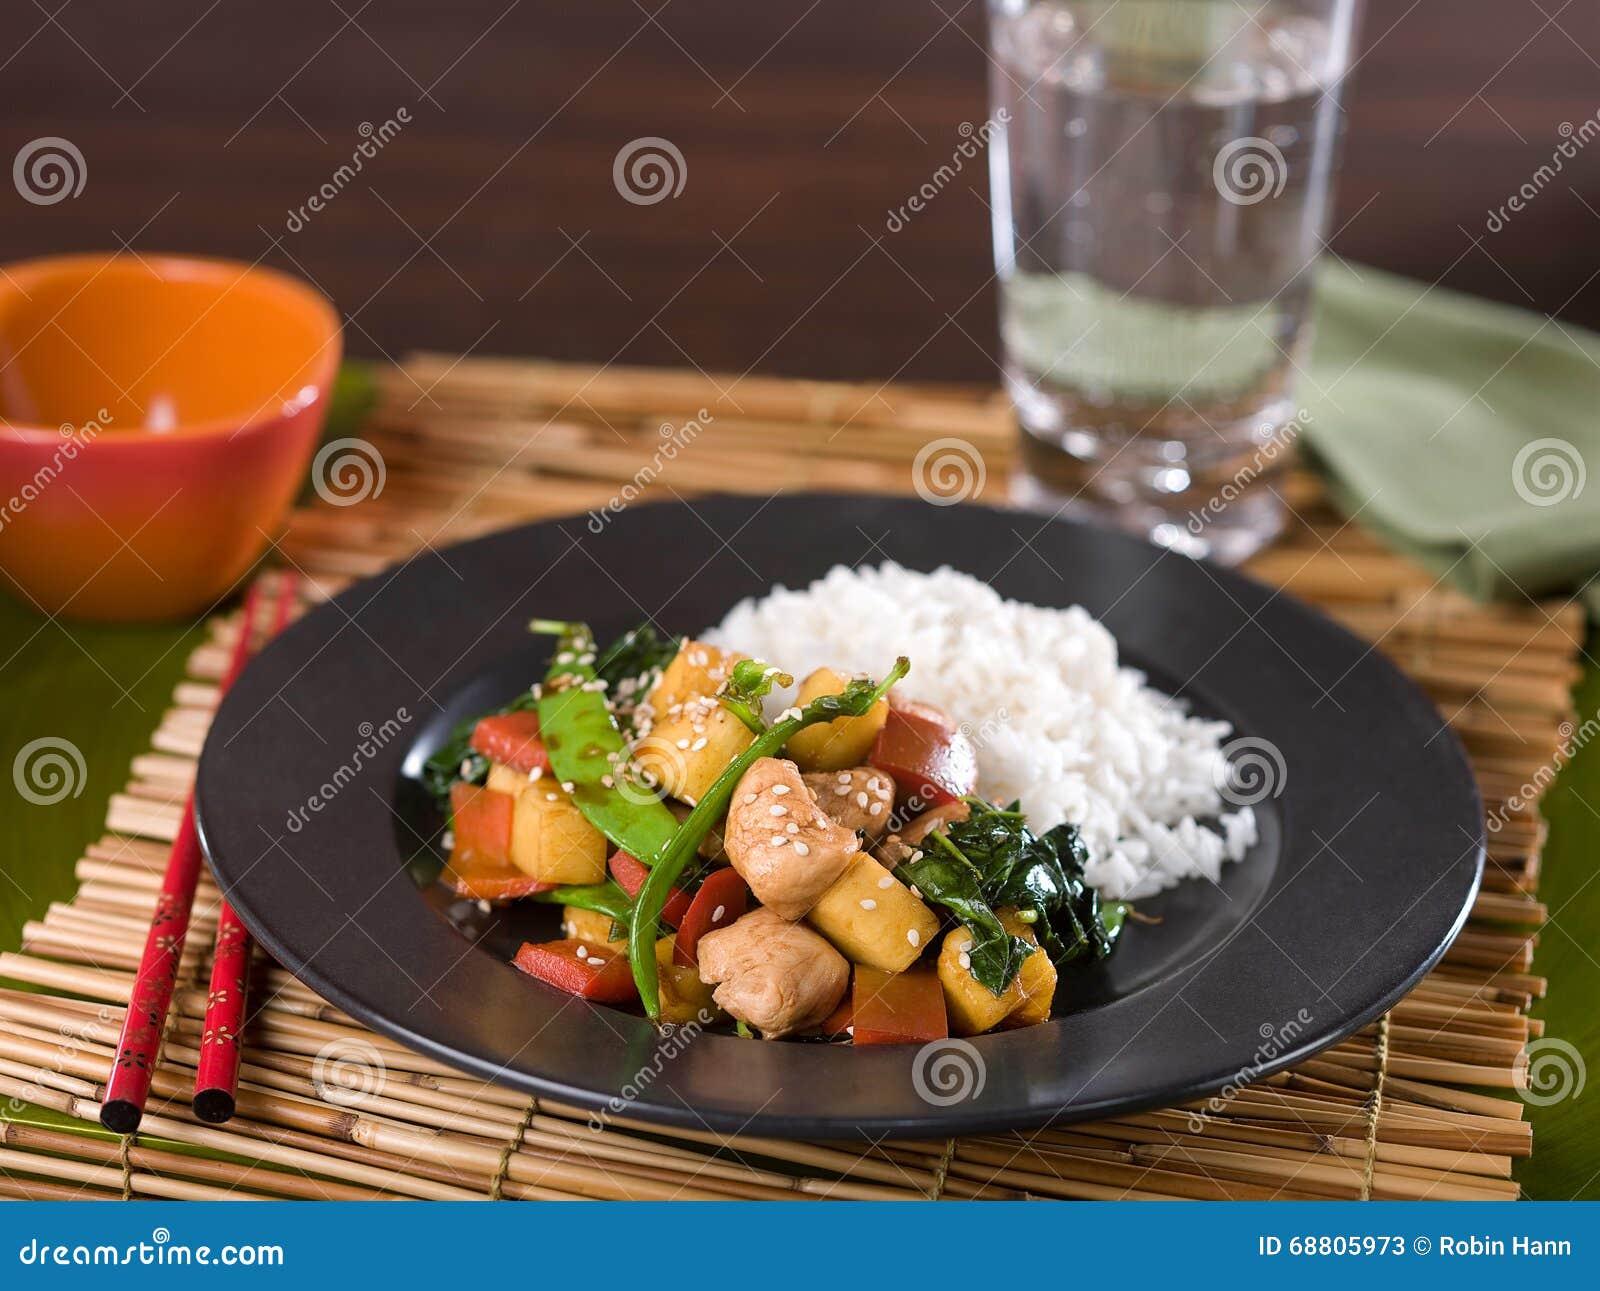 Chinese chicken and vegetable teriyaki stir fry served on dark ceramic ...